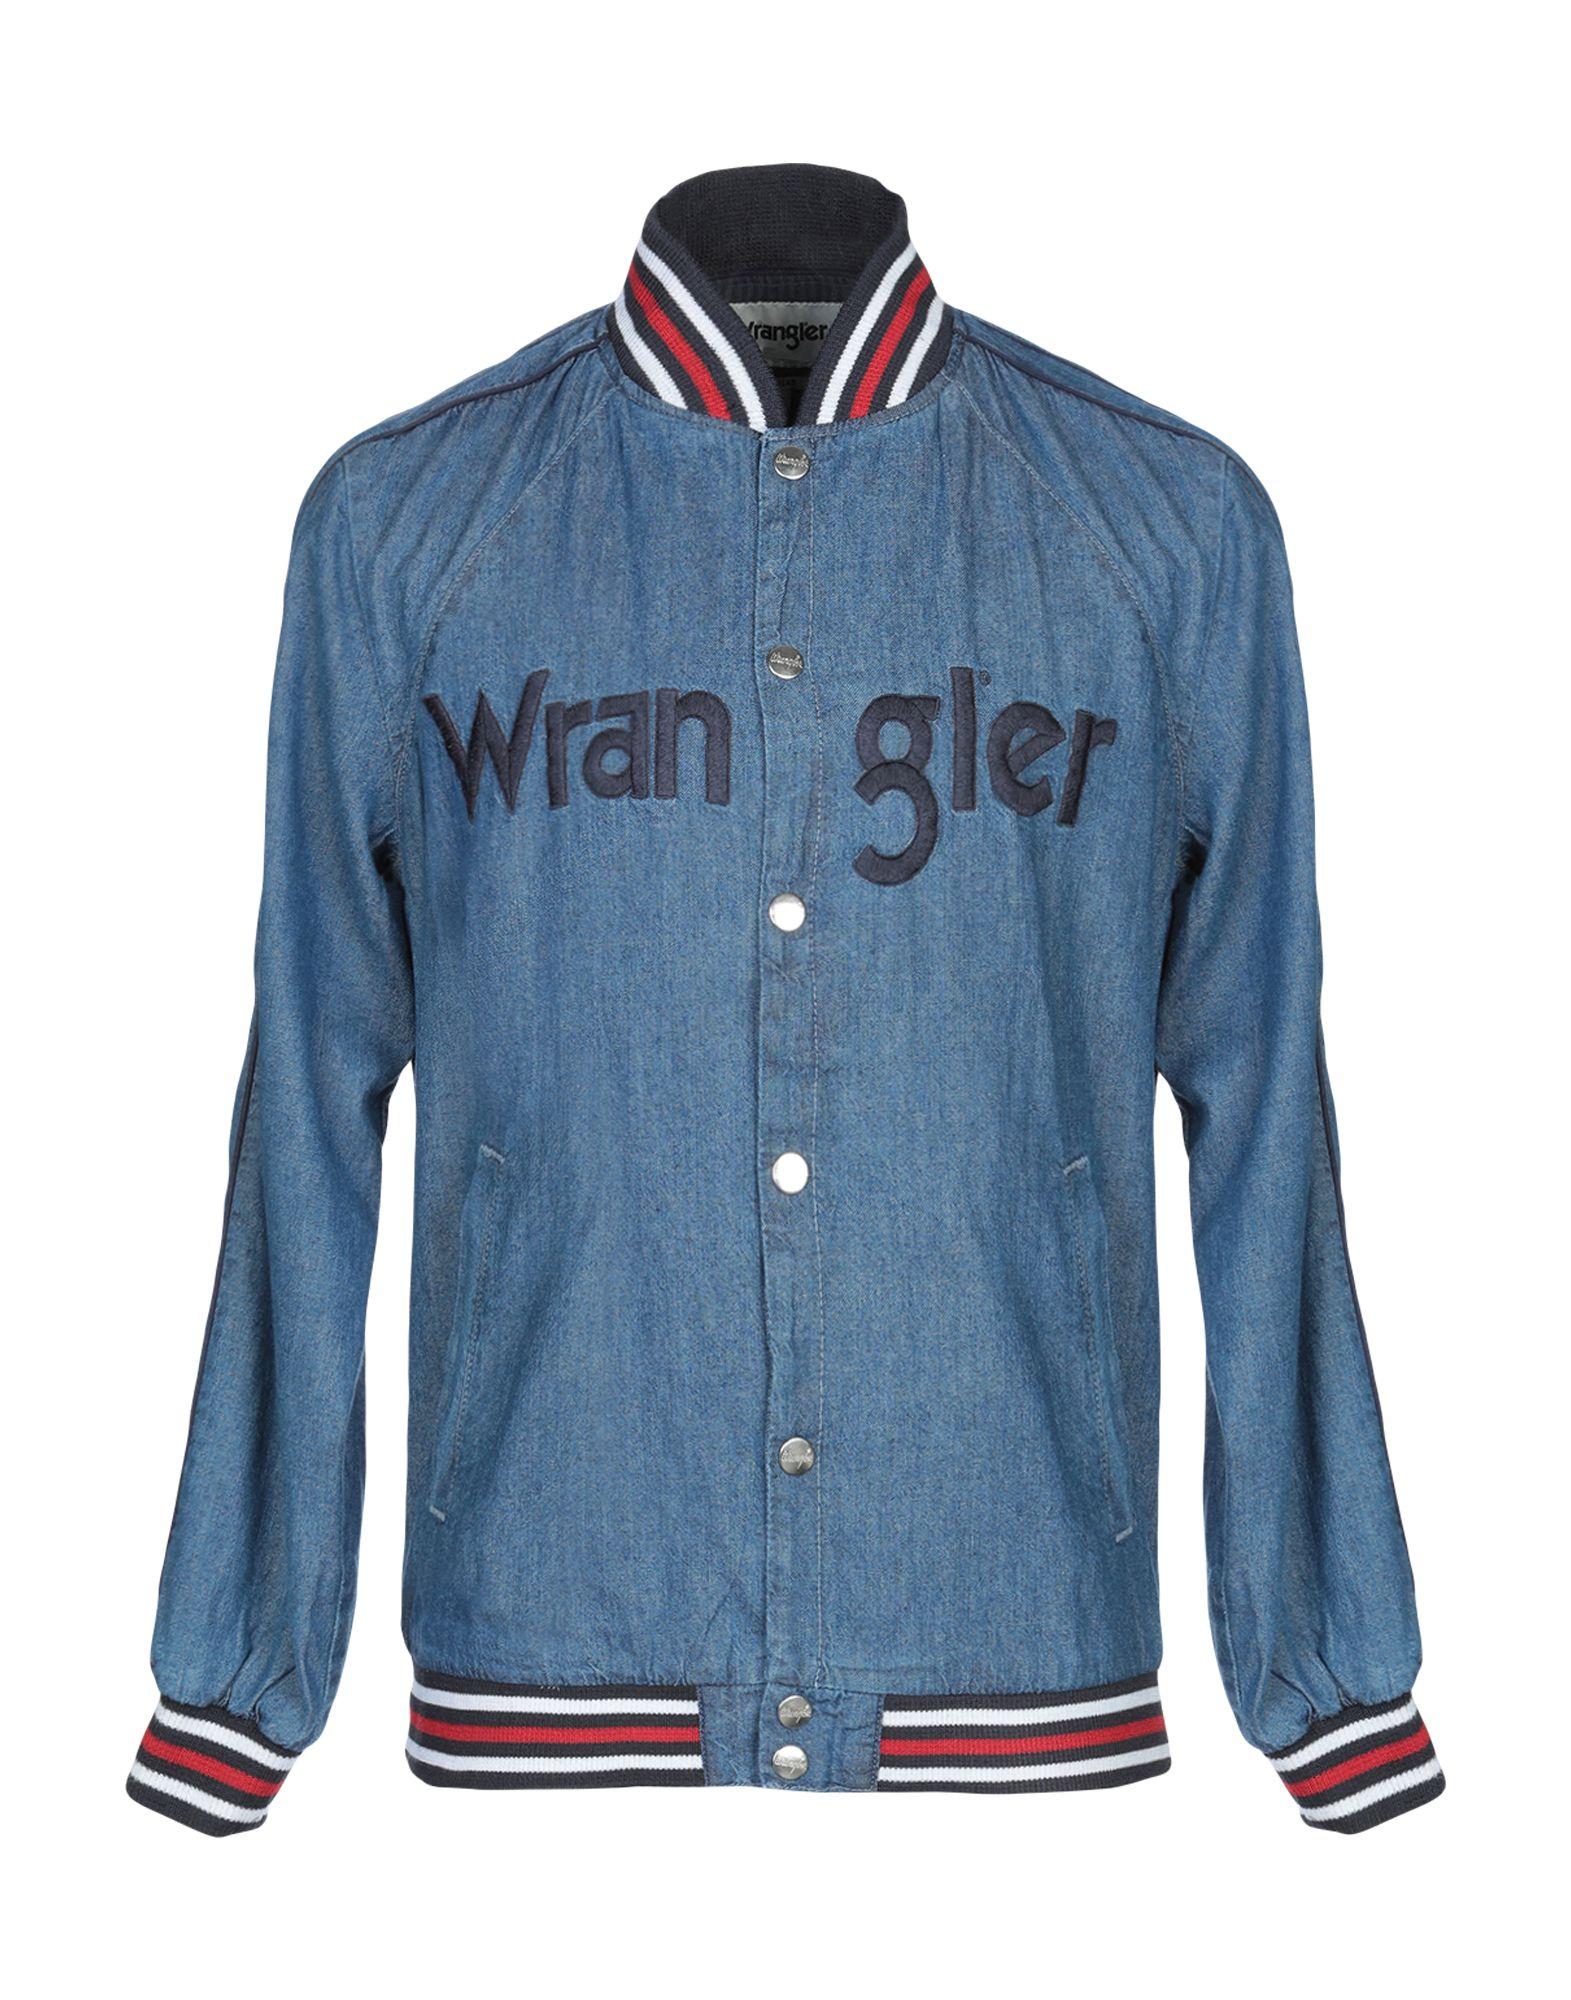 Giubbotto Giubbotto Giubbotto Jeans Wrangler uomo - 42707641MN b4e